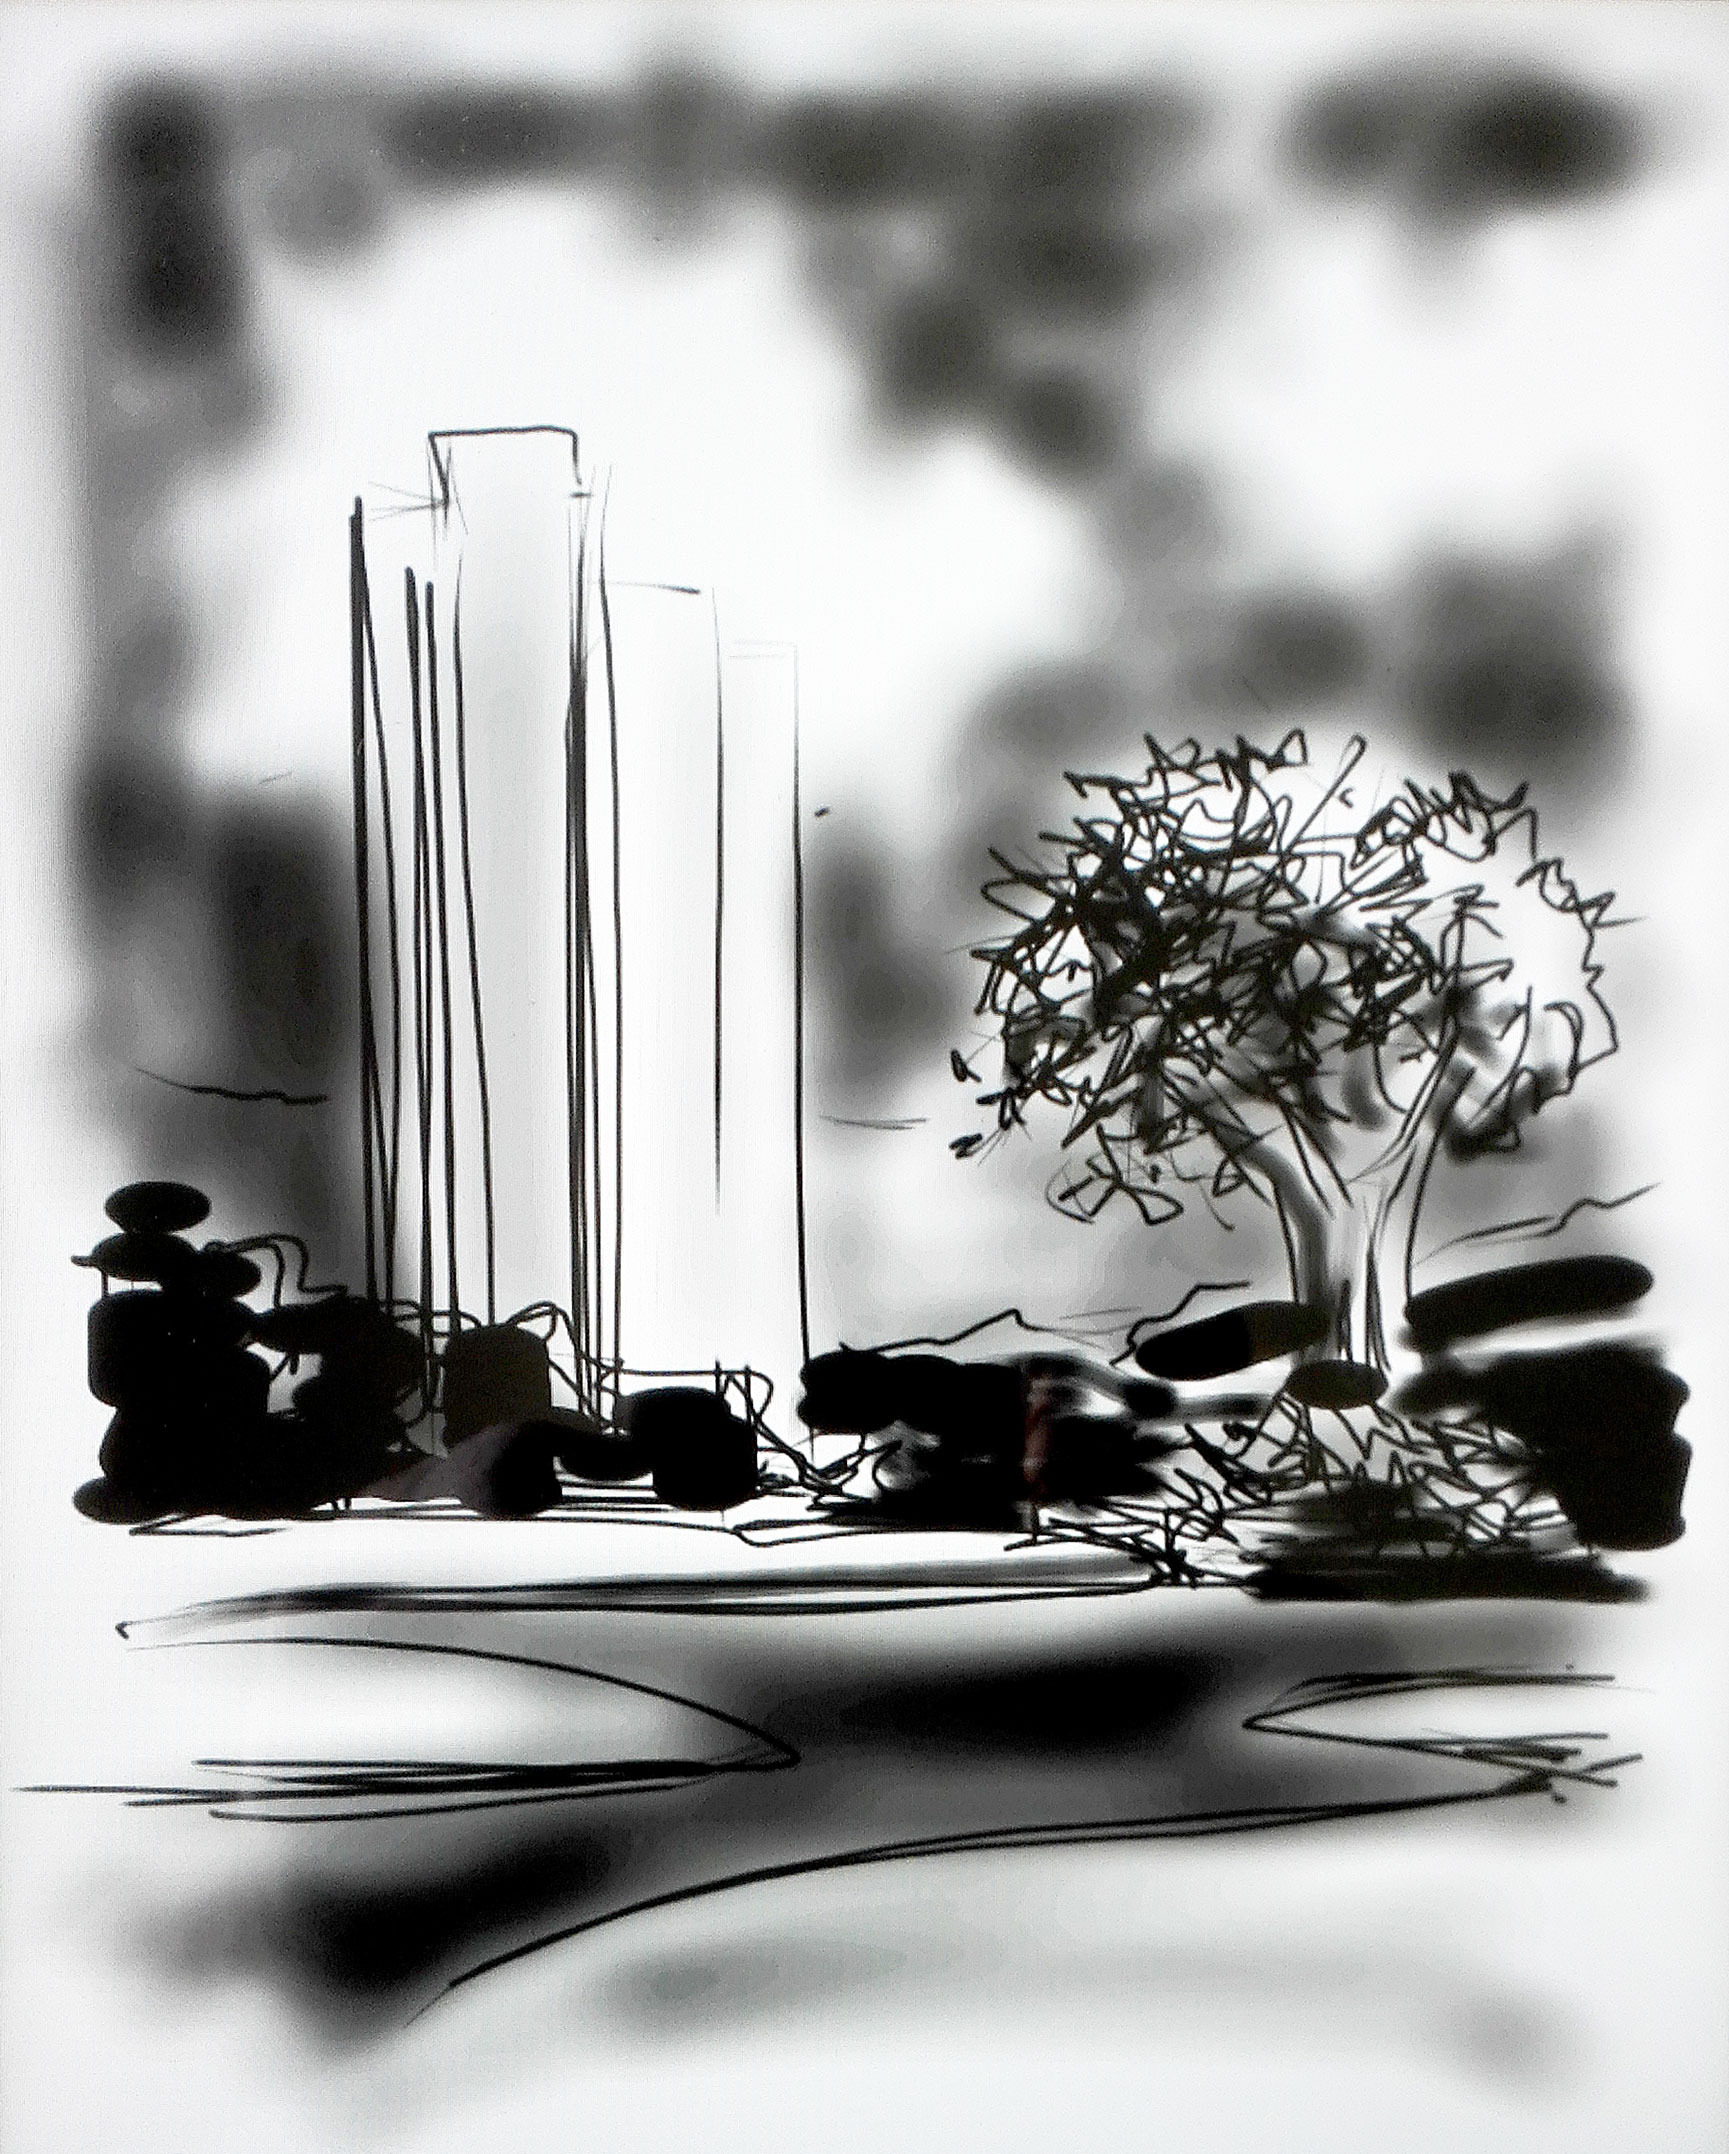 Neverlandscape by sonsunbl4